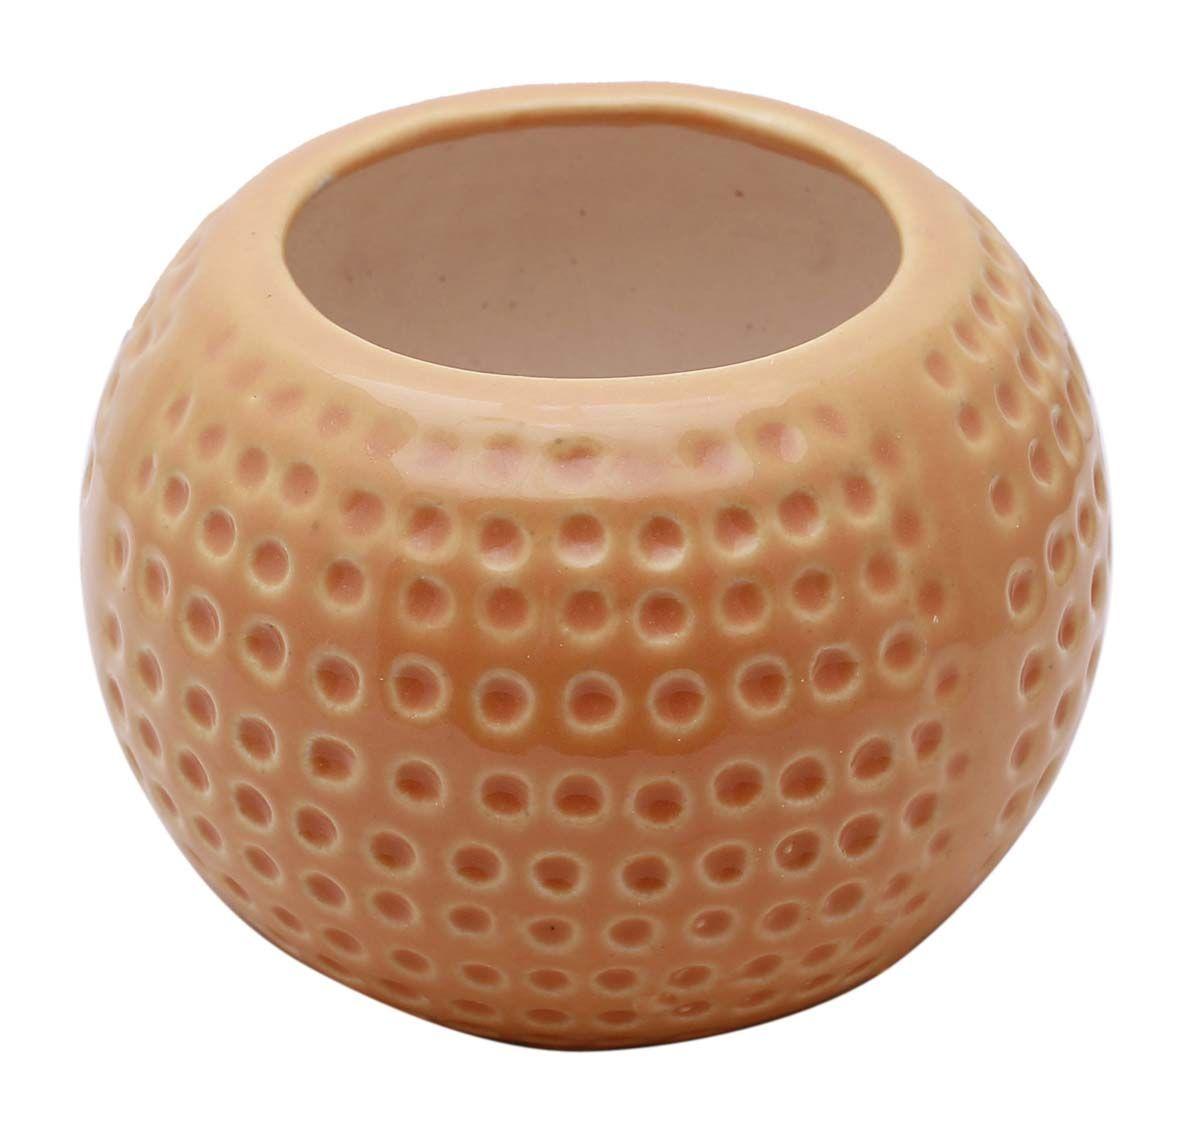 Bulk Wholesale Small Round Ceramic Planter Hand Painted Peach Garden Patio Indoor Outdoor Plant Pot Decoration Ceramic Planter Pots Ceramic Planters